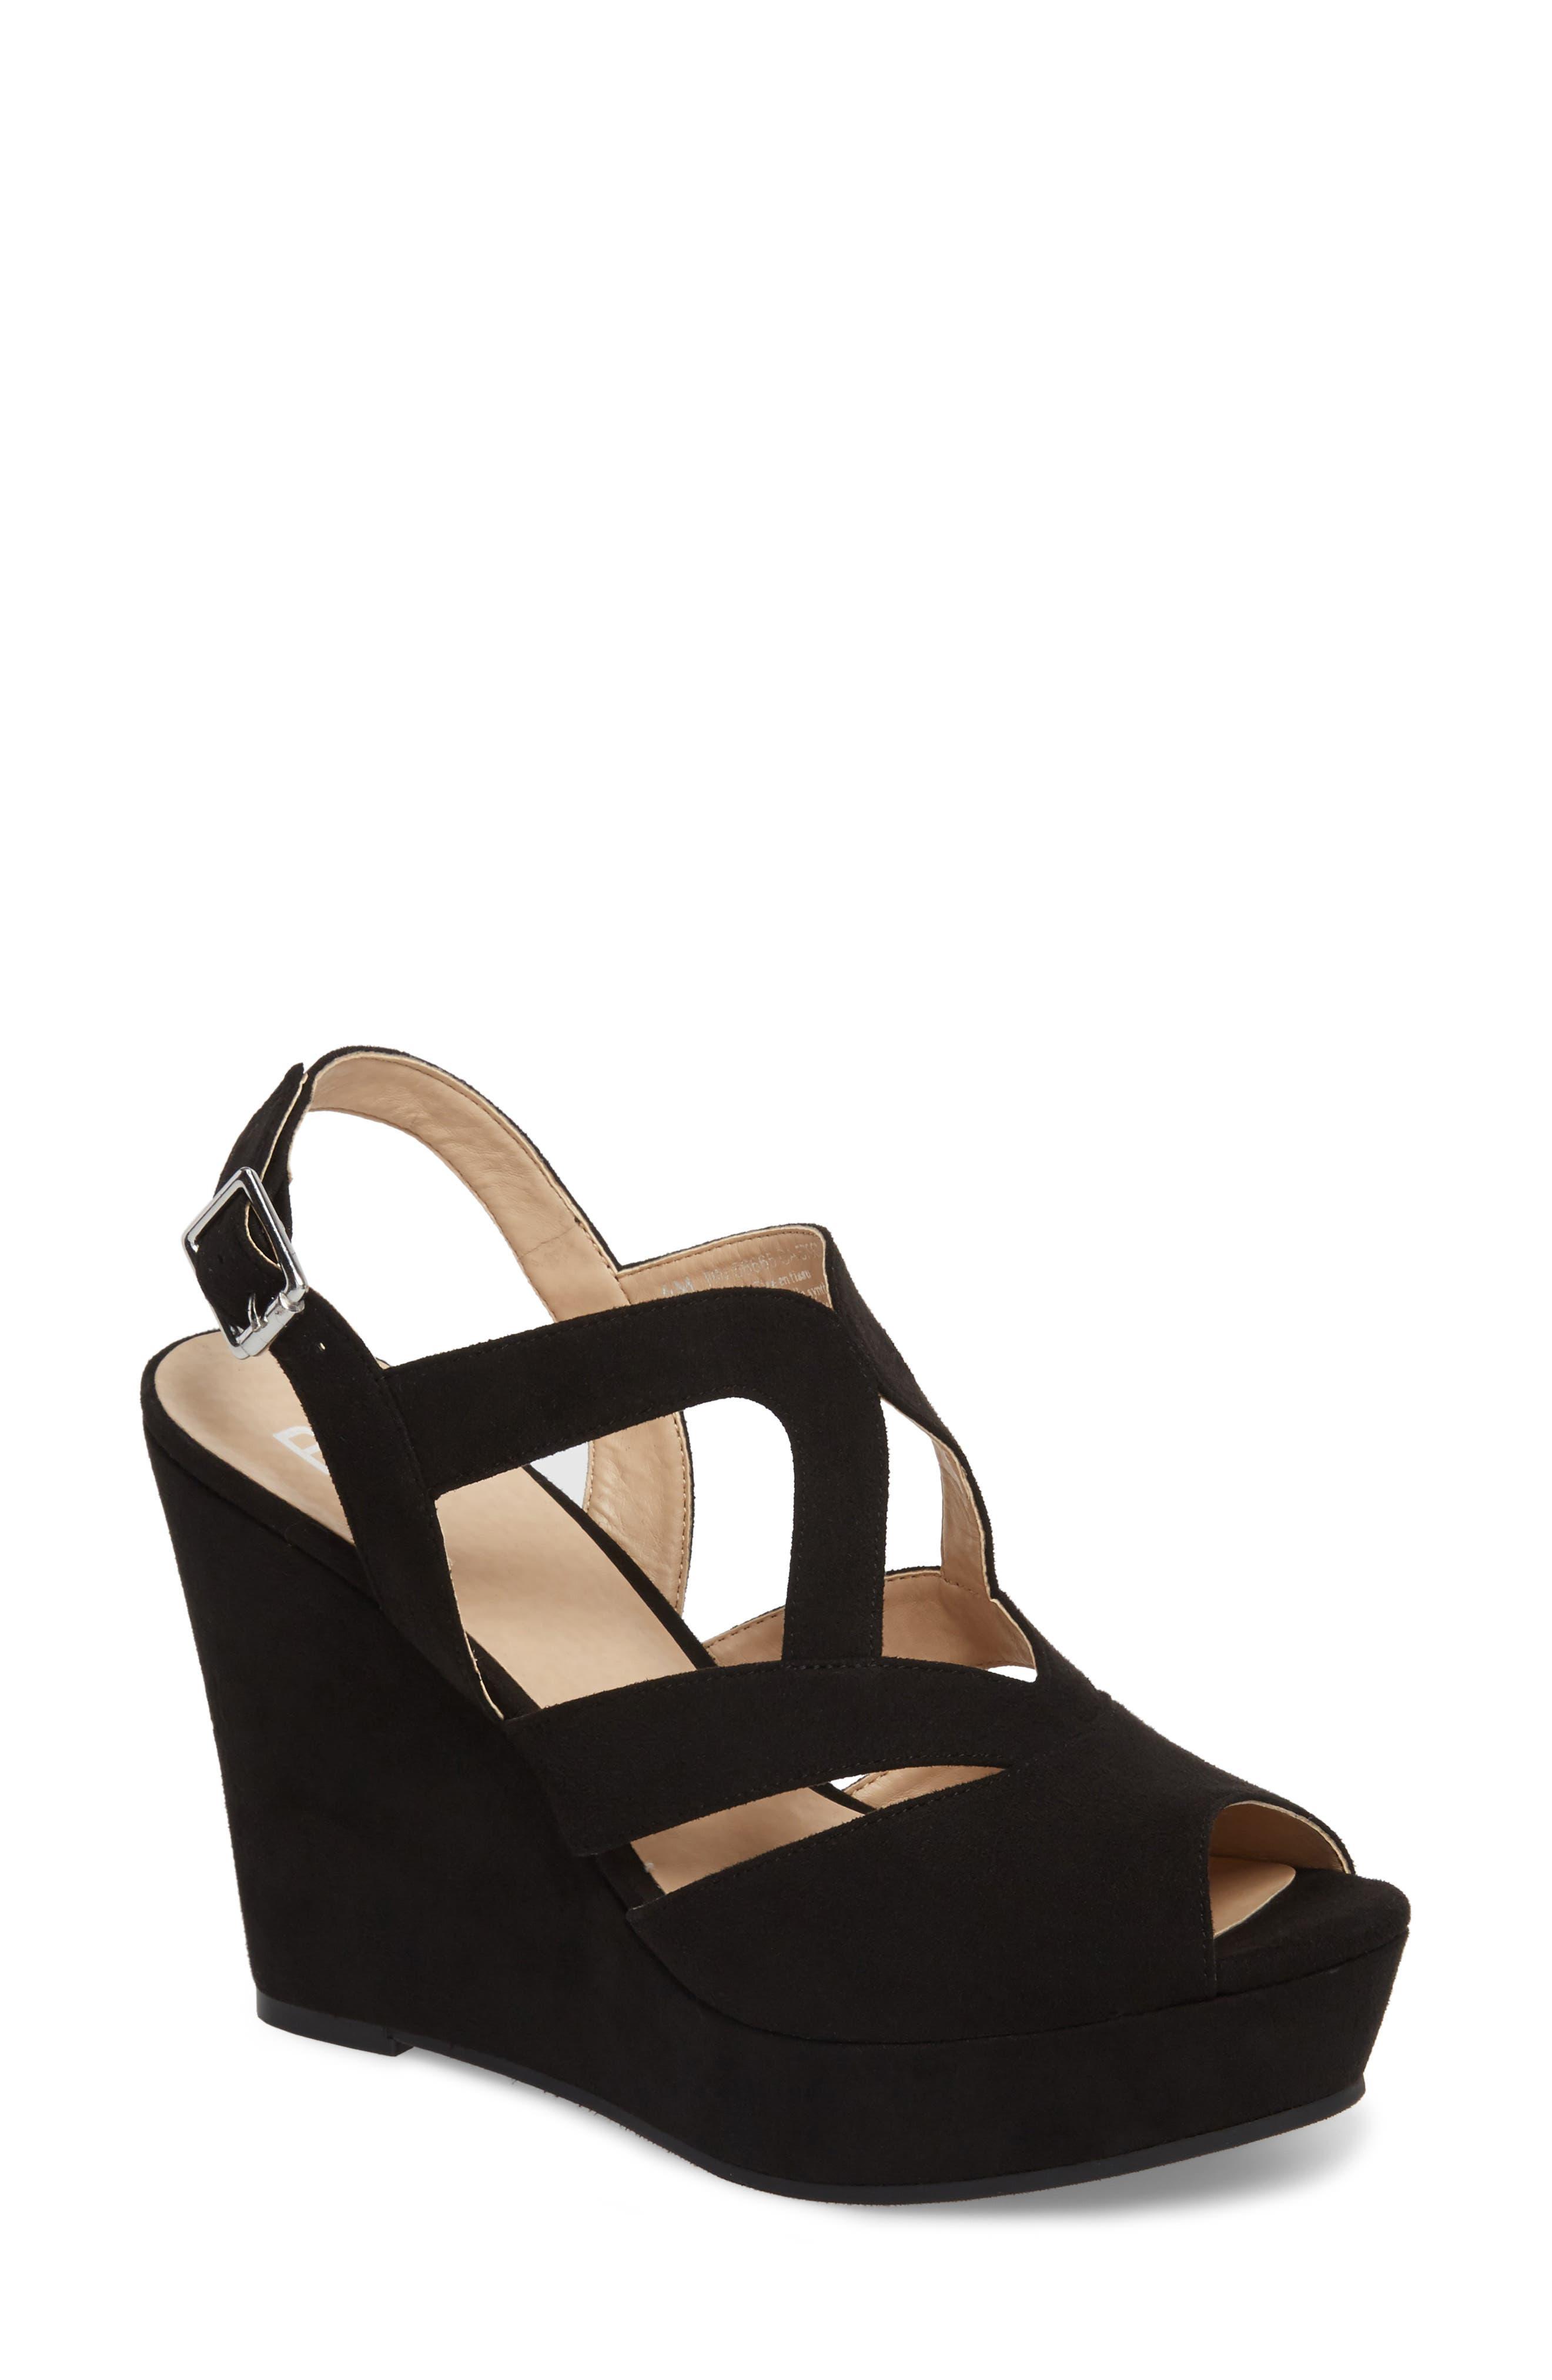 Sunny Platform Wedge Sandal,                             Main thumbnail 1, color,                             001